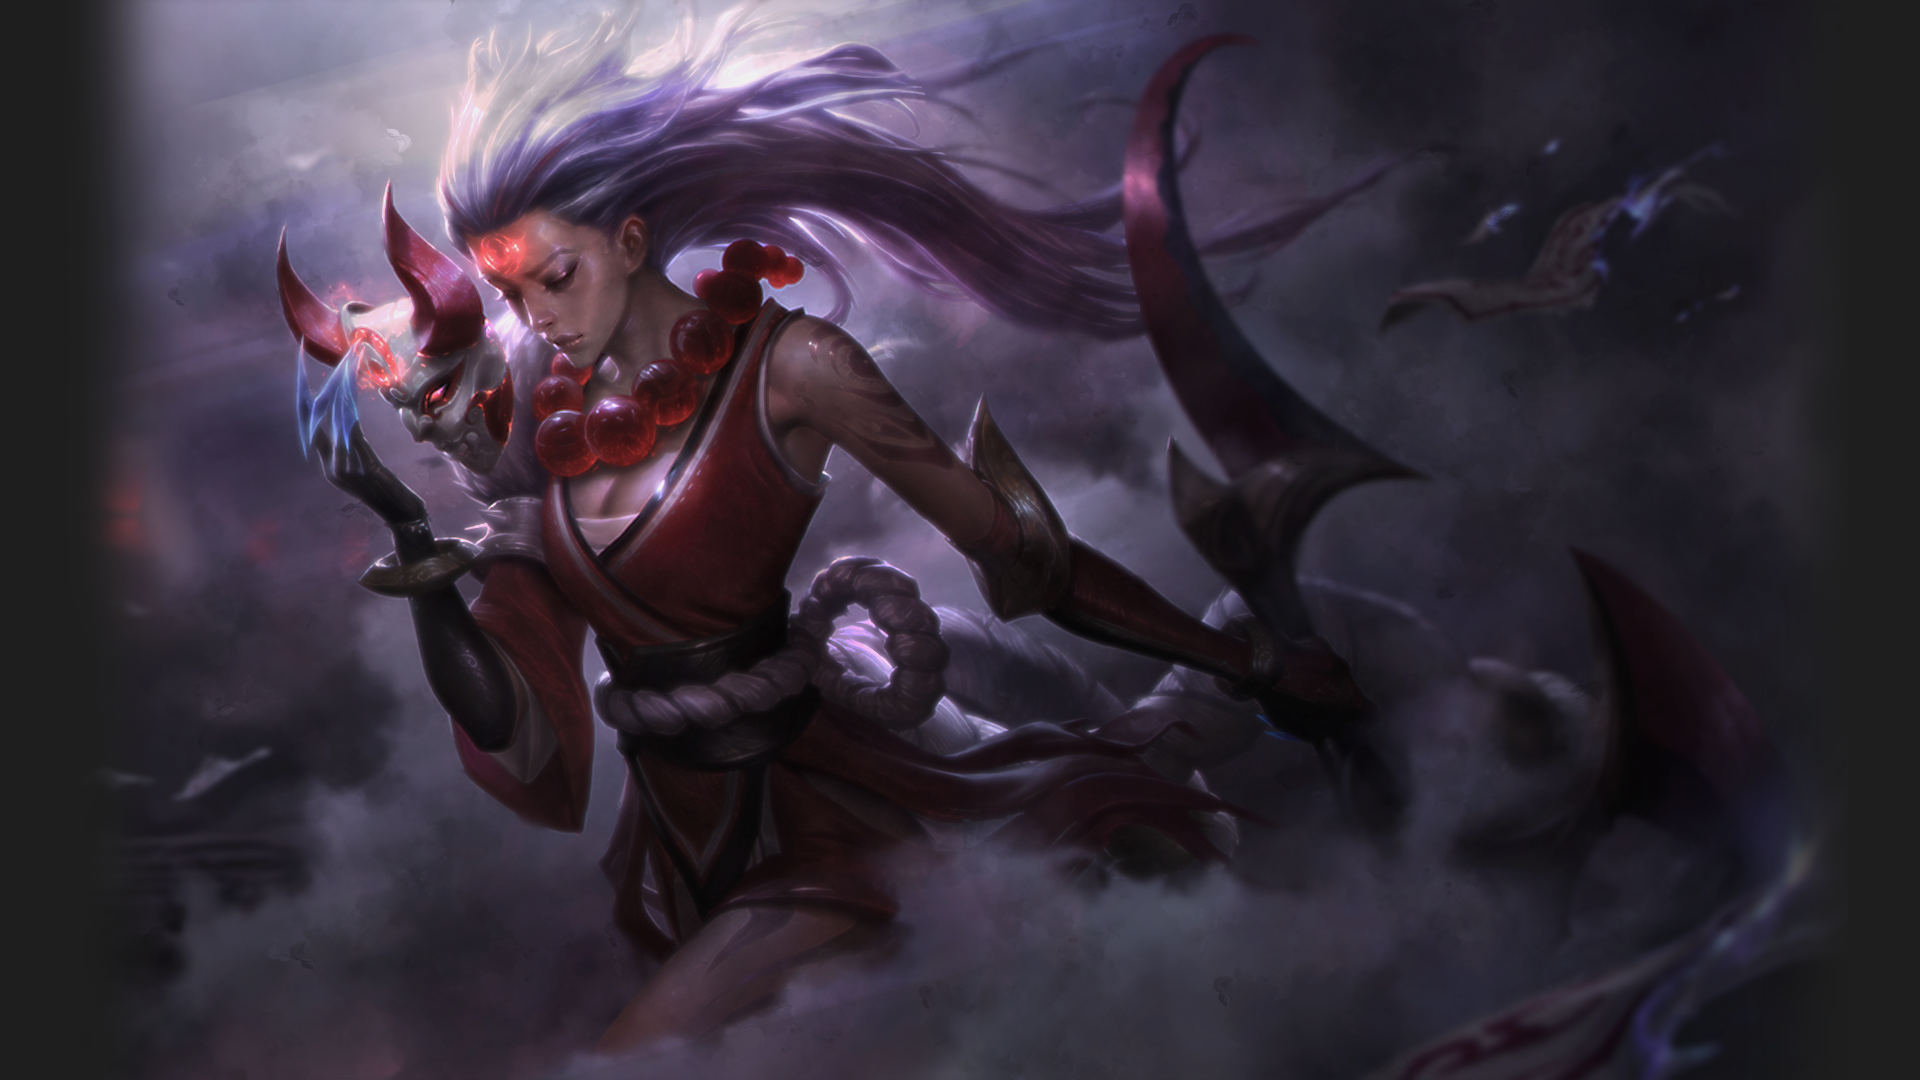 League Of Legends Blood Moon Diana By Ruanes97 On Deviantart